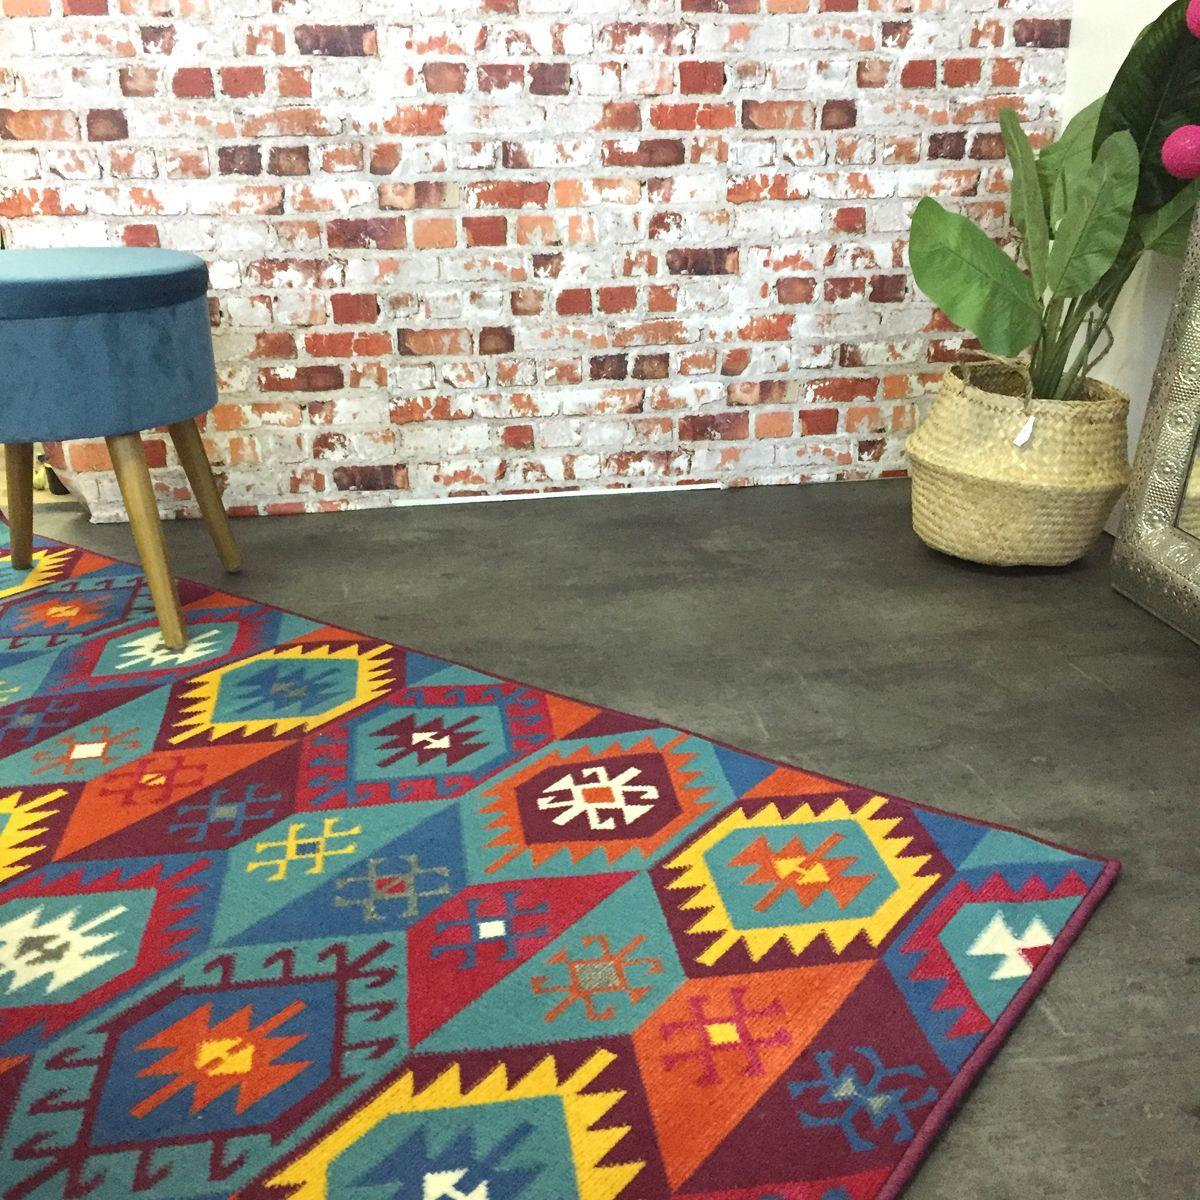 tapis motif ethnique rouge gypsi 120x170 cm kalico. Black Bedroom Furniture Sets. Home Design Ideas